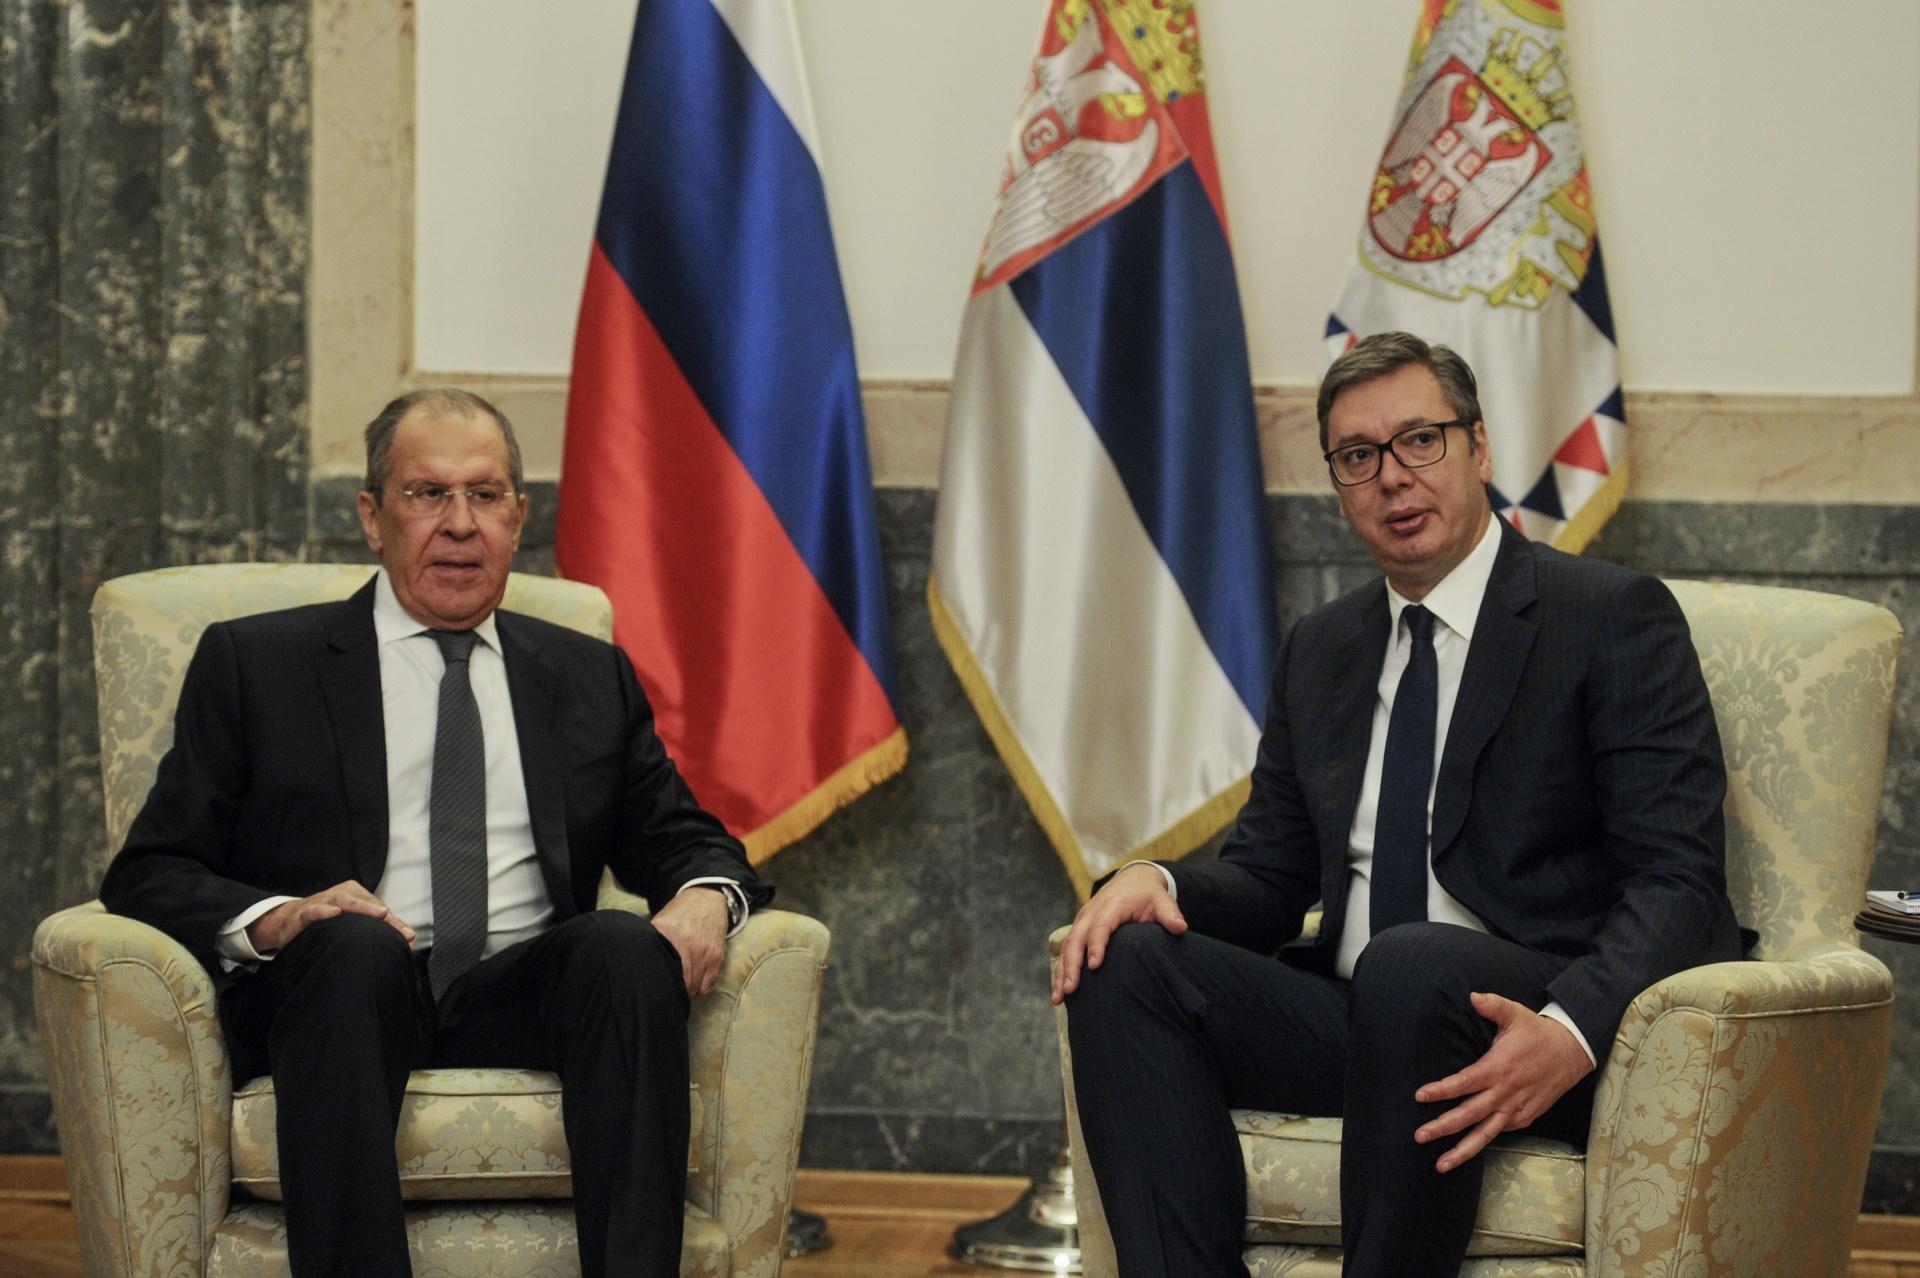 Predsednik Srbije Aleksandar Vucic i ministar spoljnih poslova Ruske Federacije Srgej Lavrov.